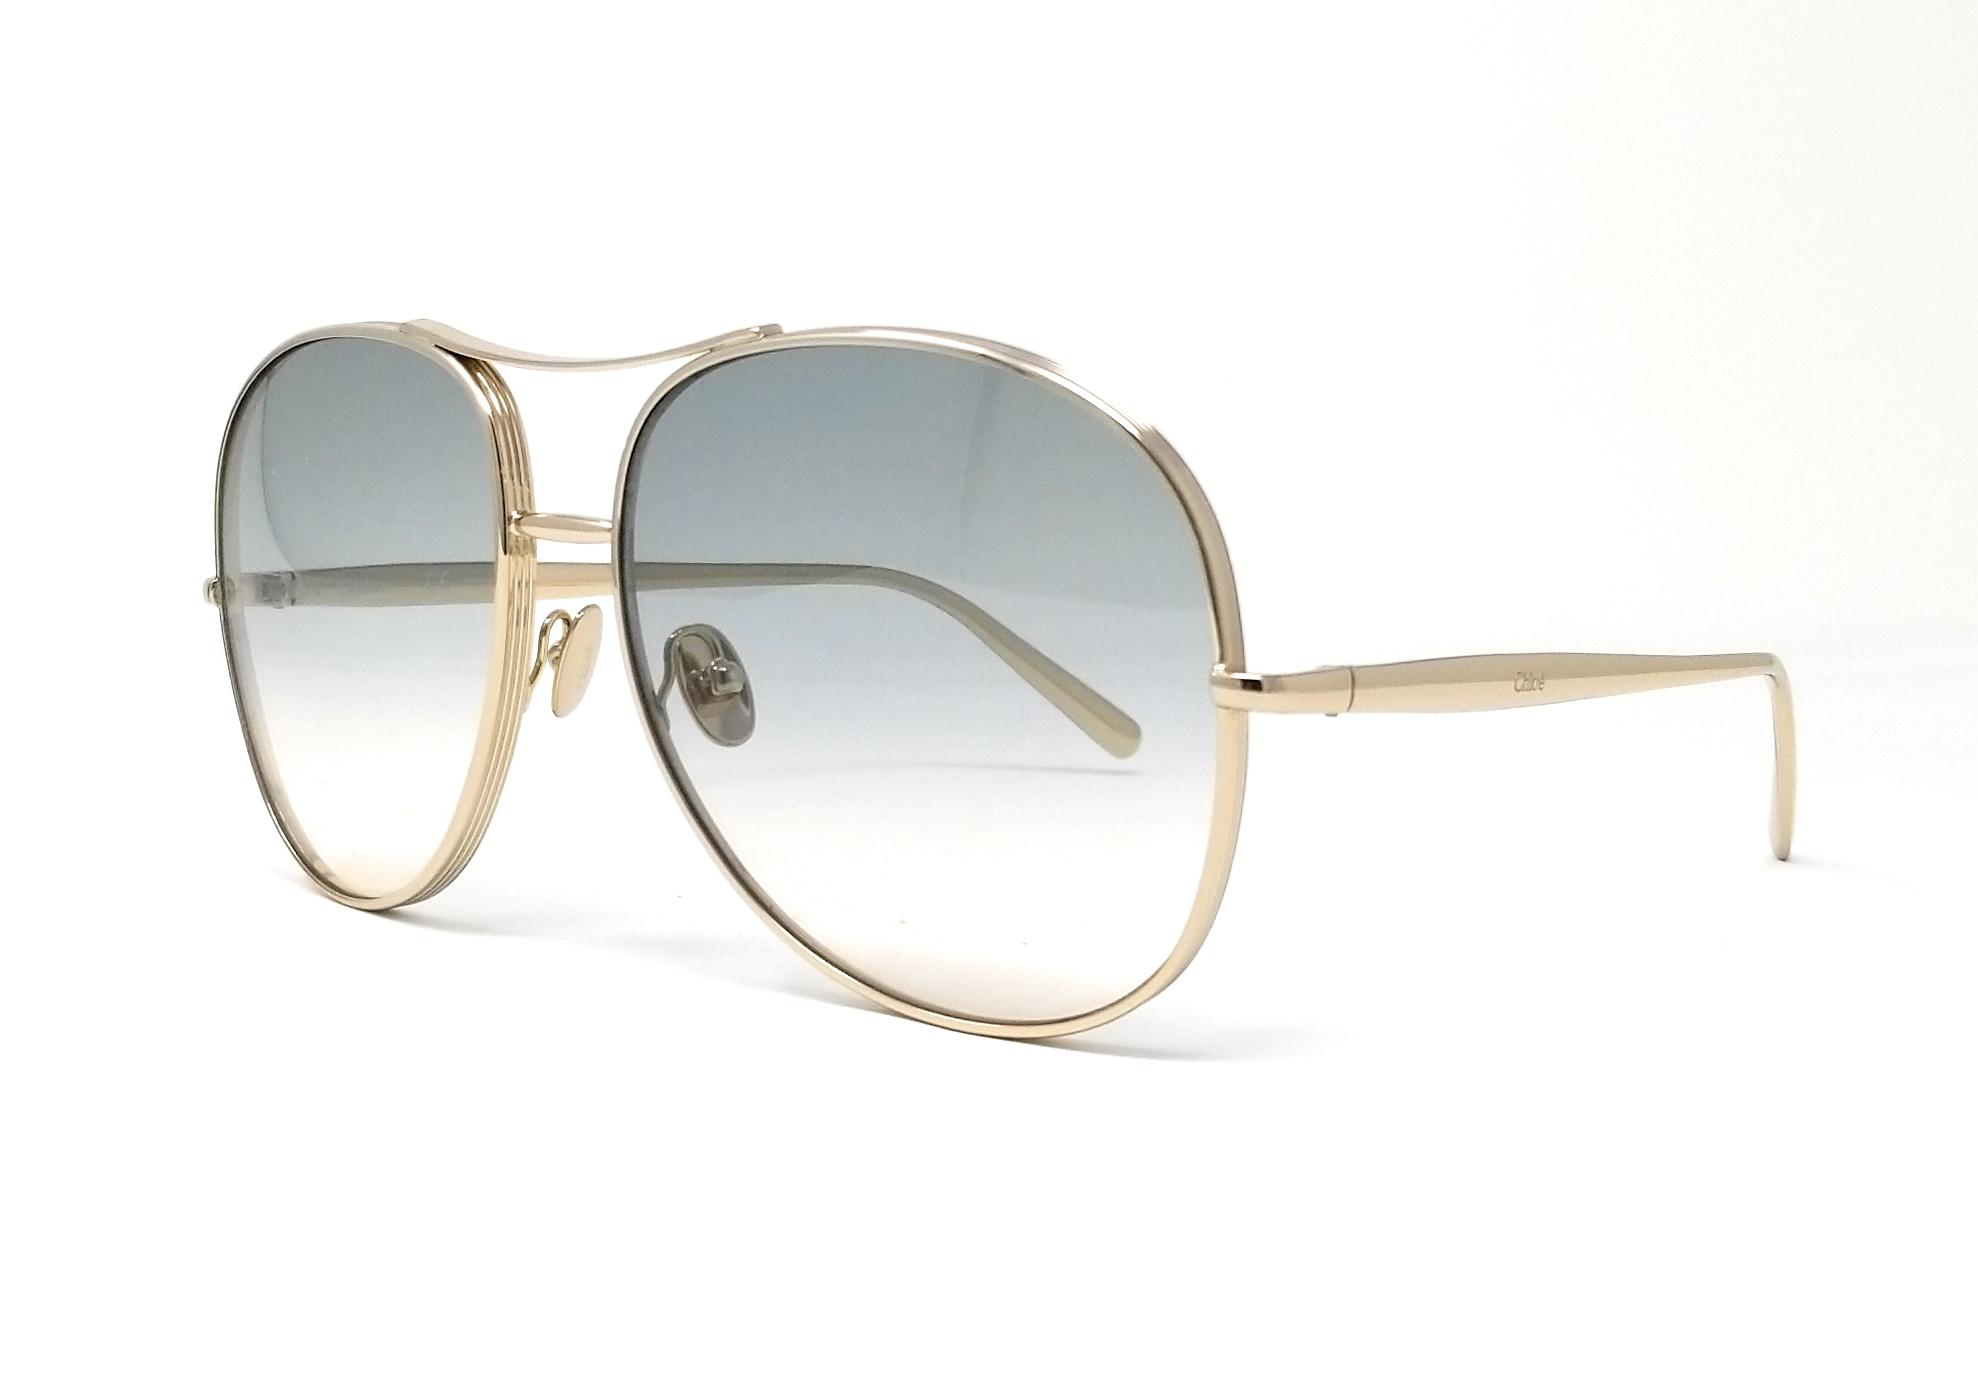 043d4cb00186 Details about CHLOE Sunglasses CE127S 768 Light Gold Light Grey Aviator  61x16x135